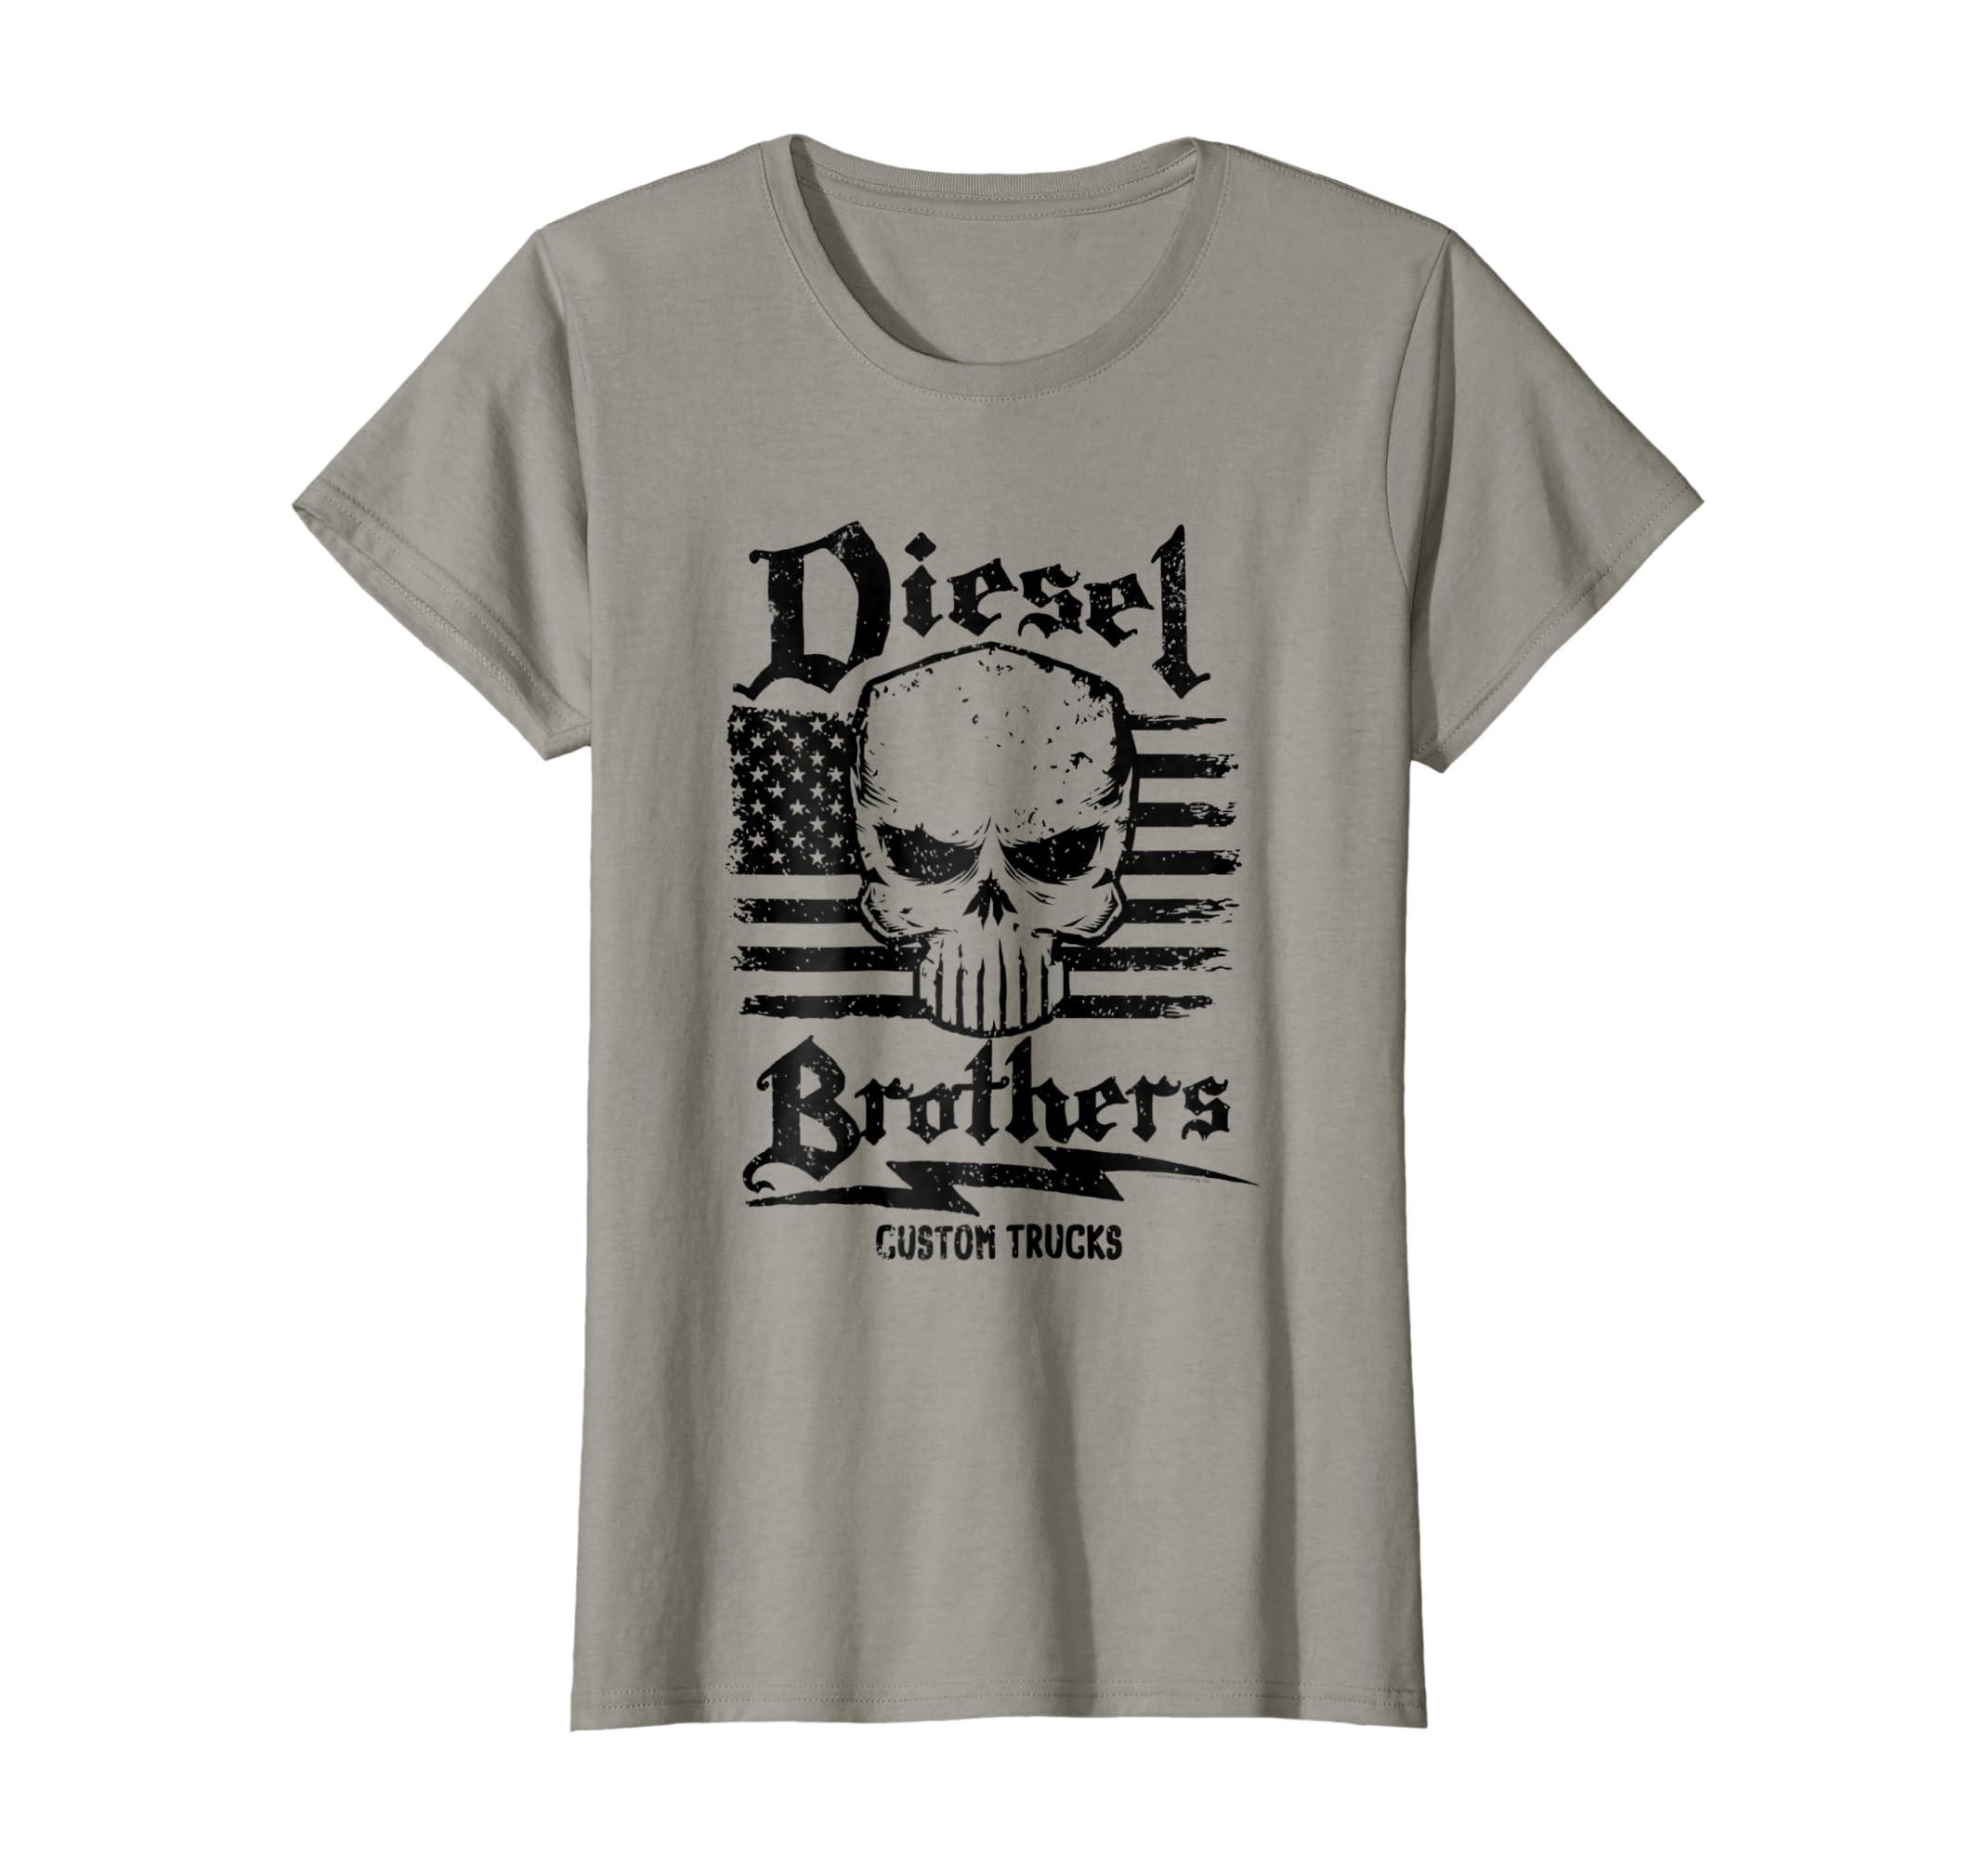 83d907a3 Amazon.com: Diesel Brothers Custom Trucks Skull USA Flag Graphic T-Shirt:  Clothing